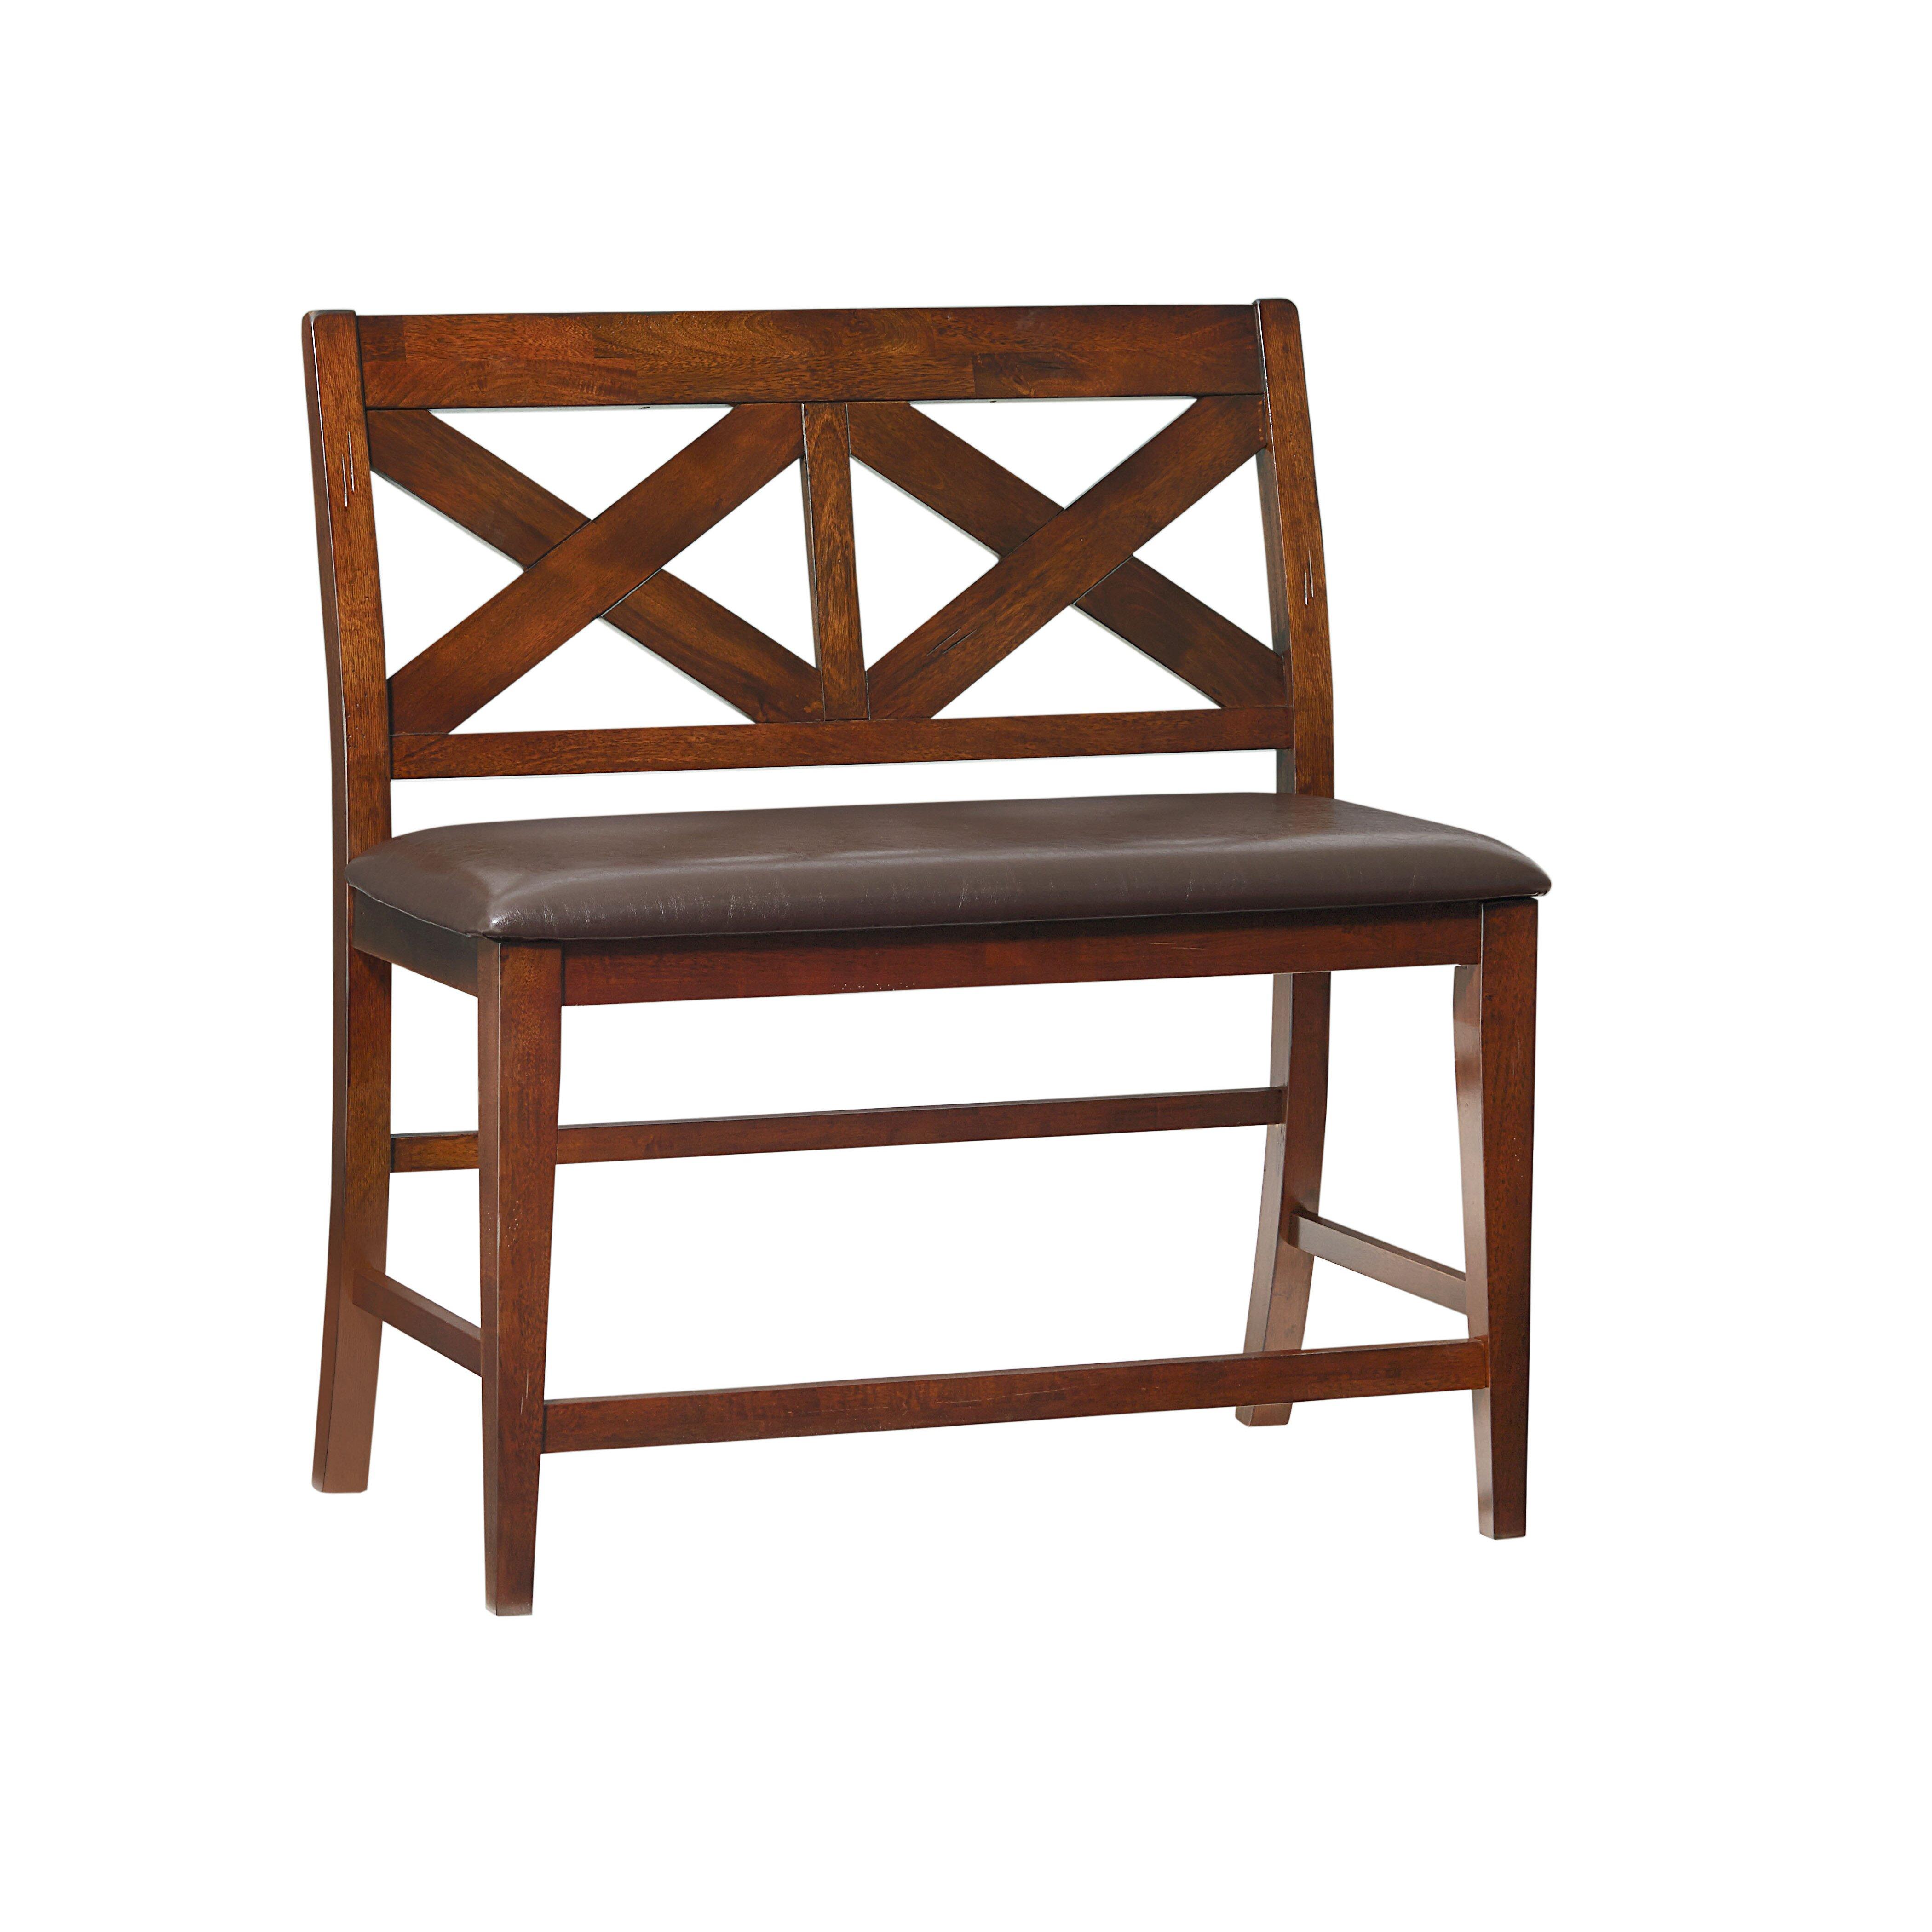 Standard Furniture Omaha Wood Kitchen Bench & Reviews